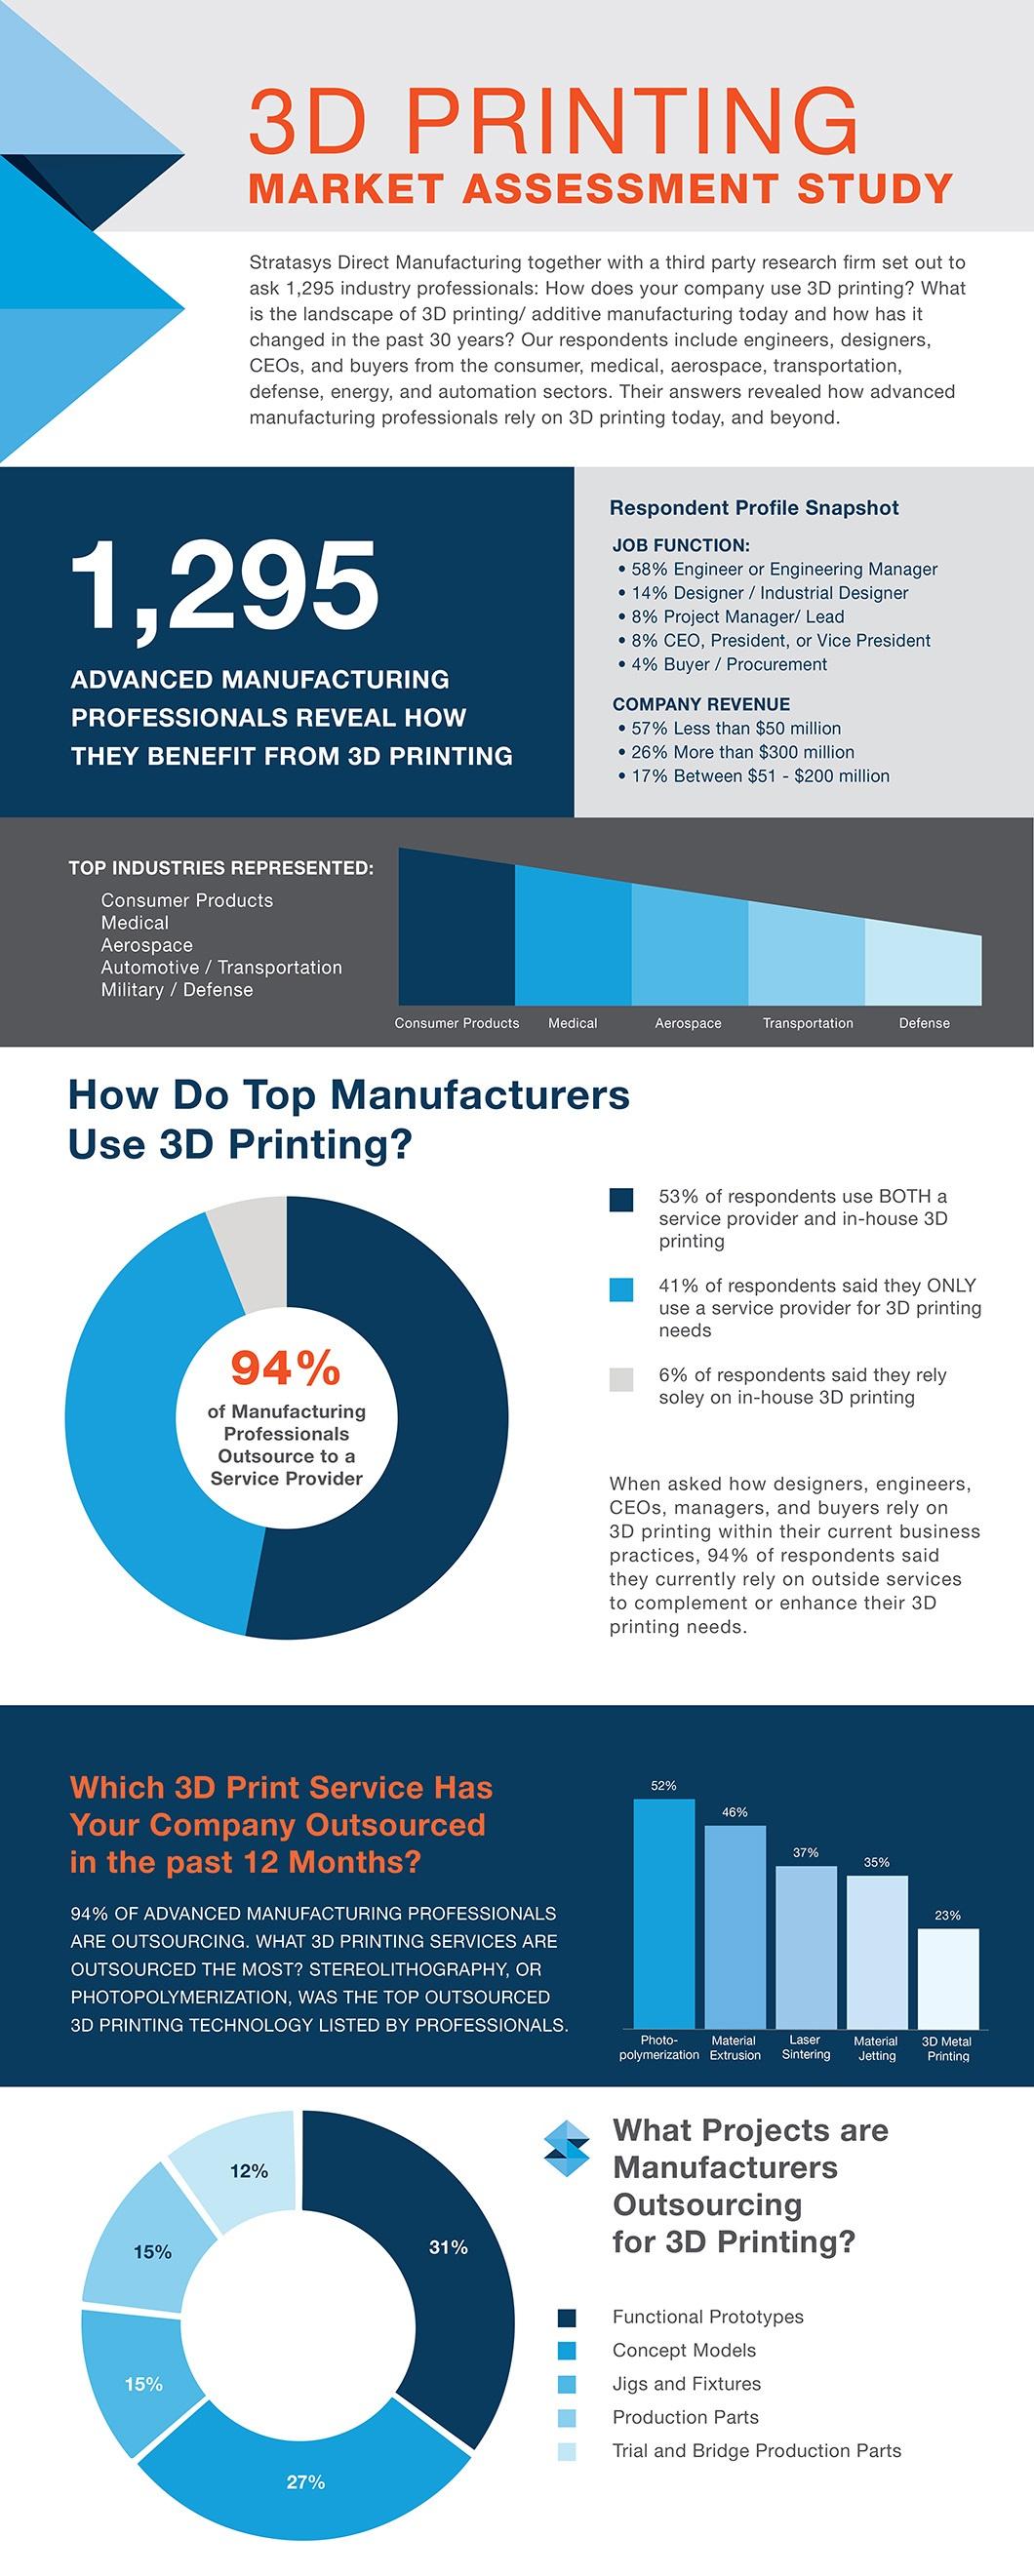 3D Printing Market Assessment Study